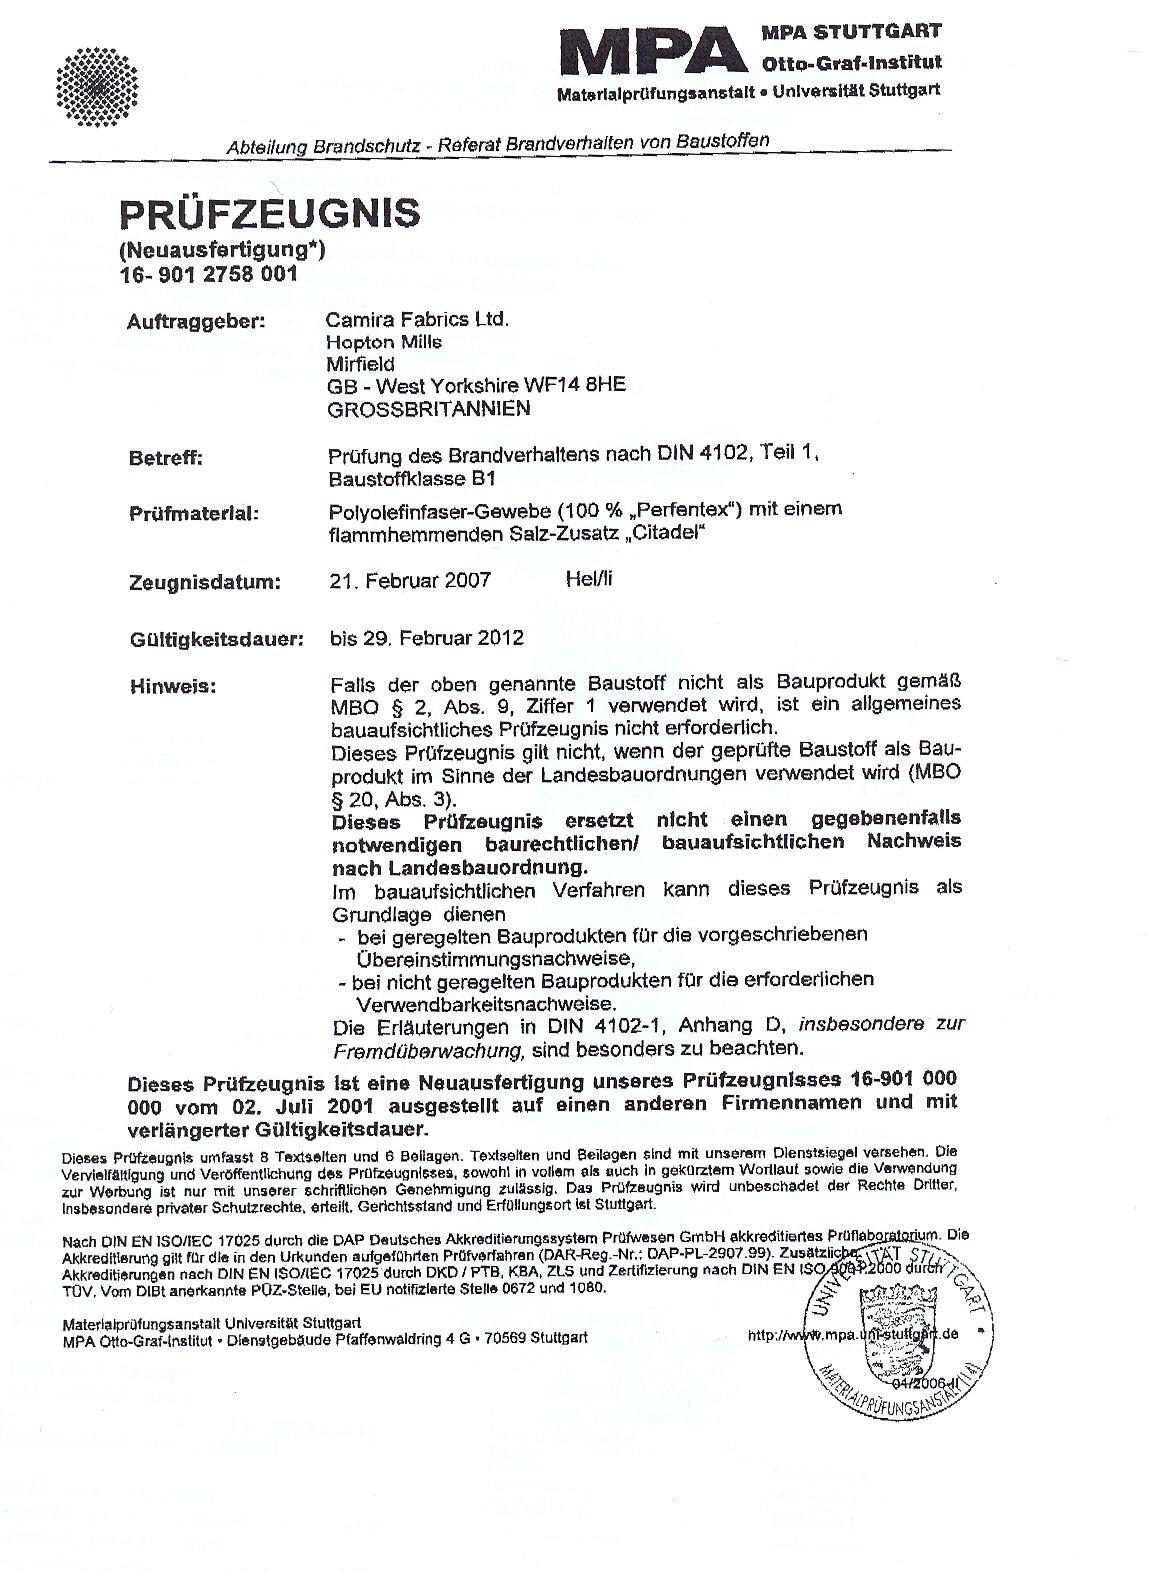 Berühmt Brandschutz Zertifikat Vorlage Galerie - Entry Level Resume ...